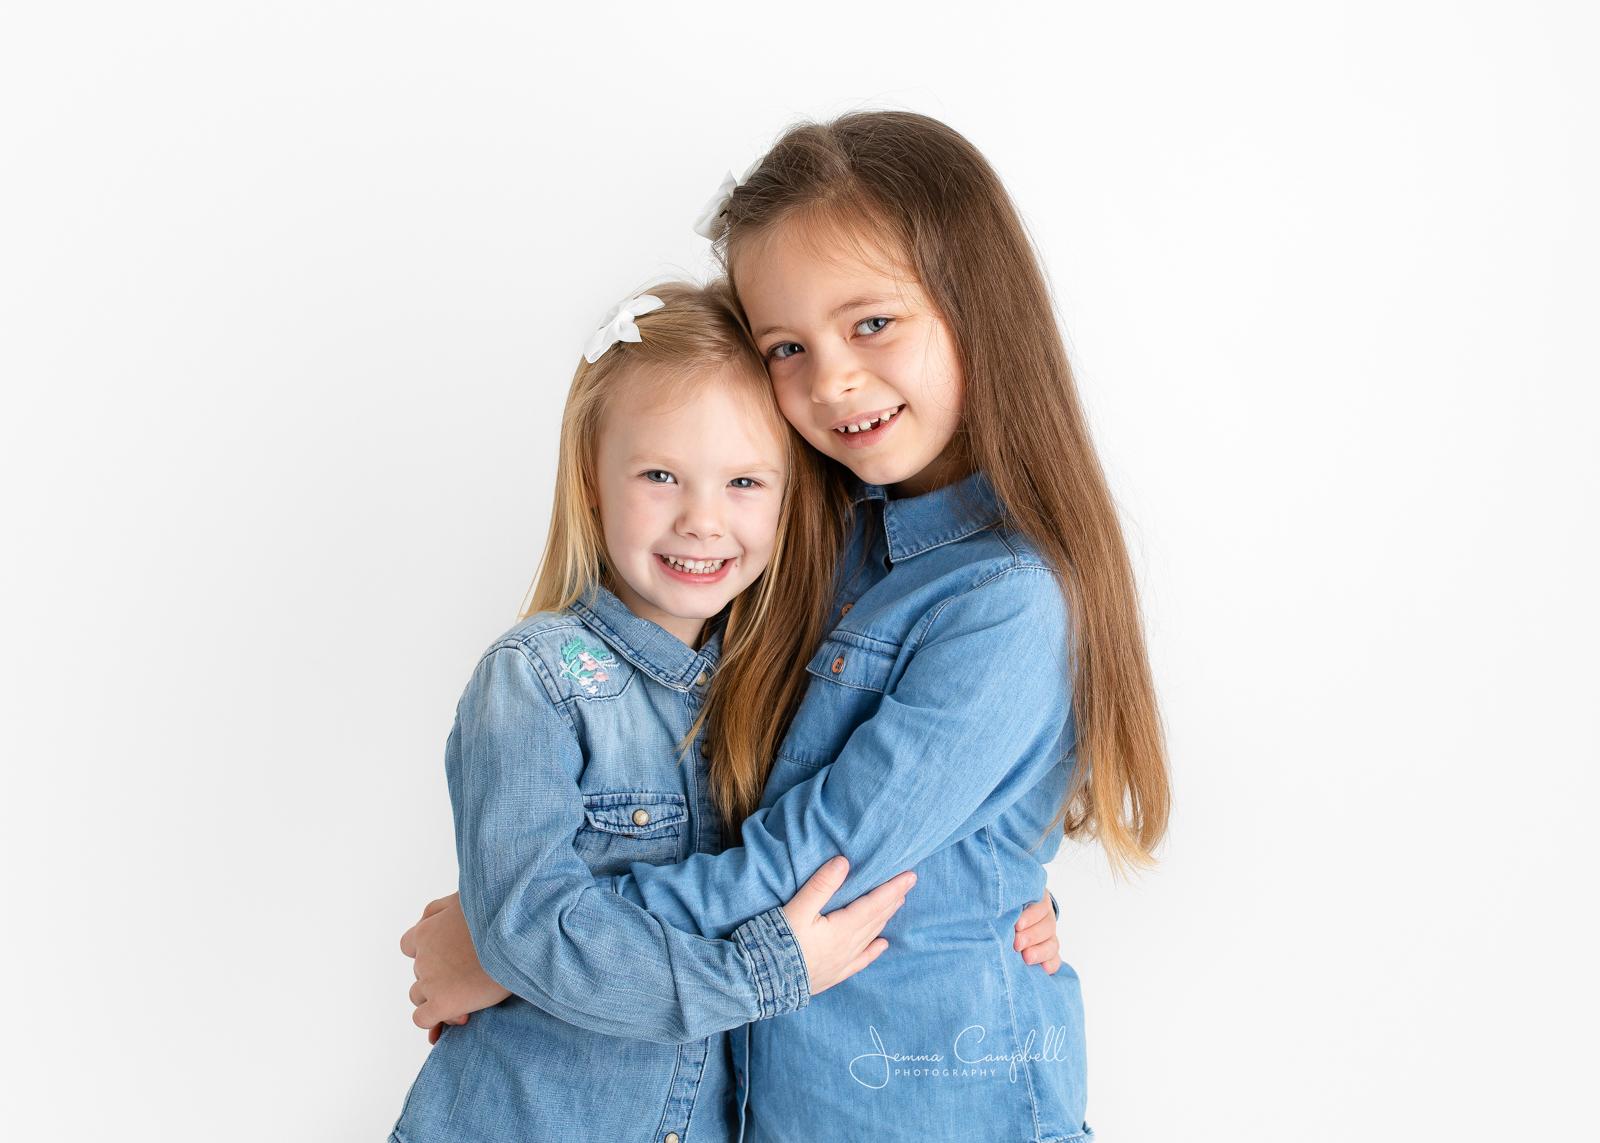 Family Photoshoot, family photographer, family photography, children photoshoot, baby photography, baby photoshoot,studio photography, studio photoshoot, high wycombe, buckinghamshire